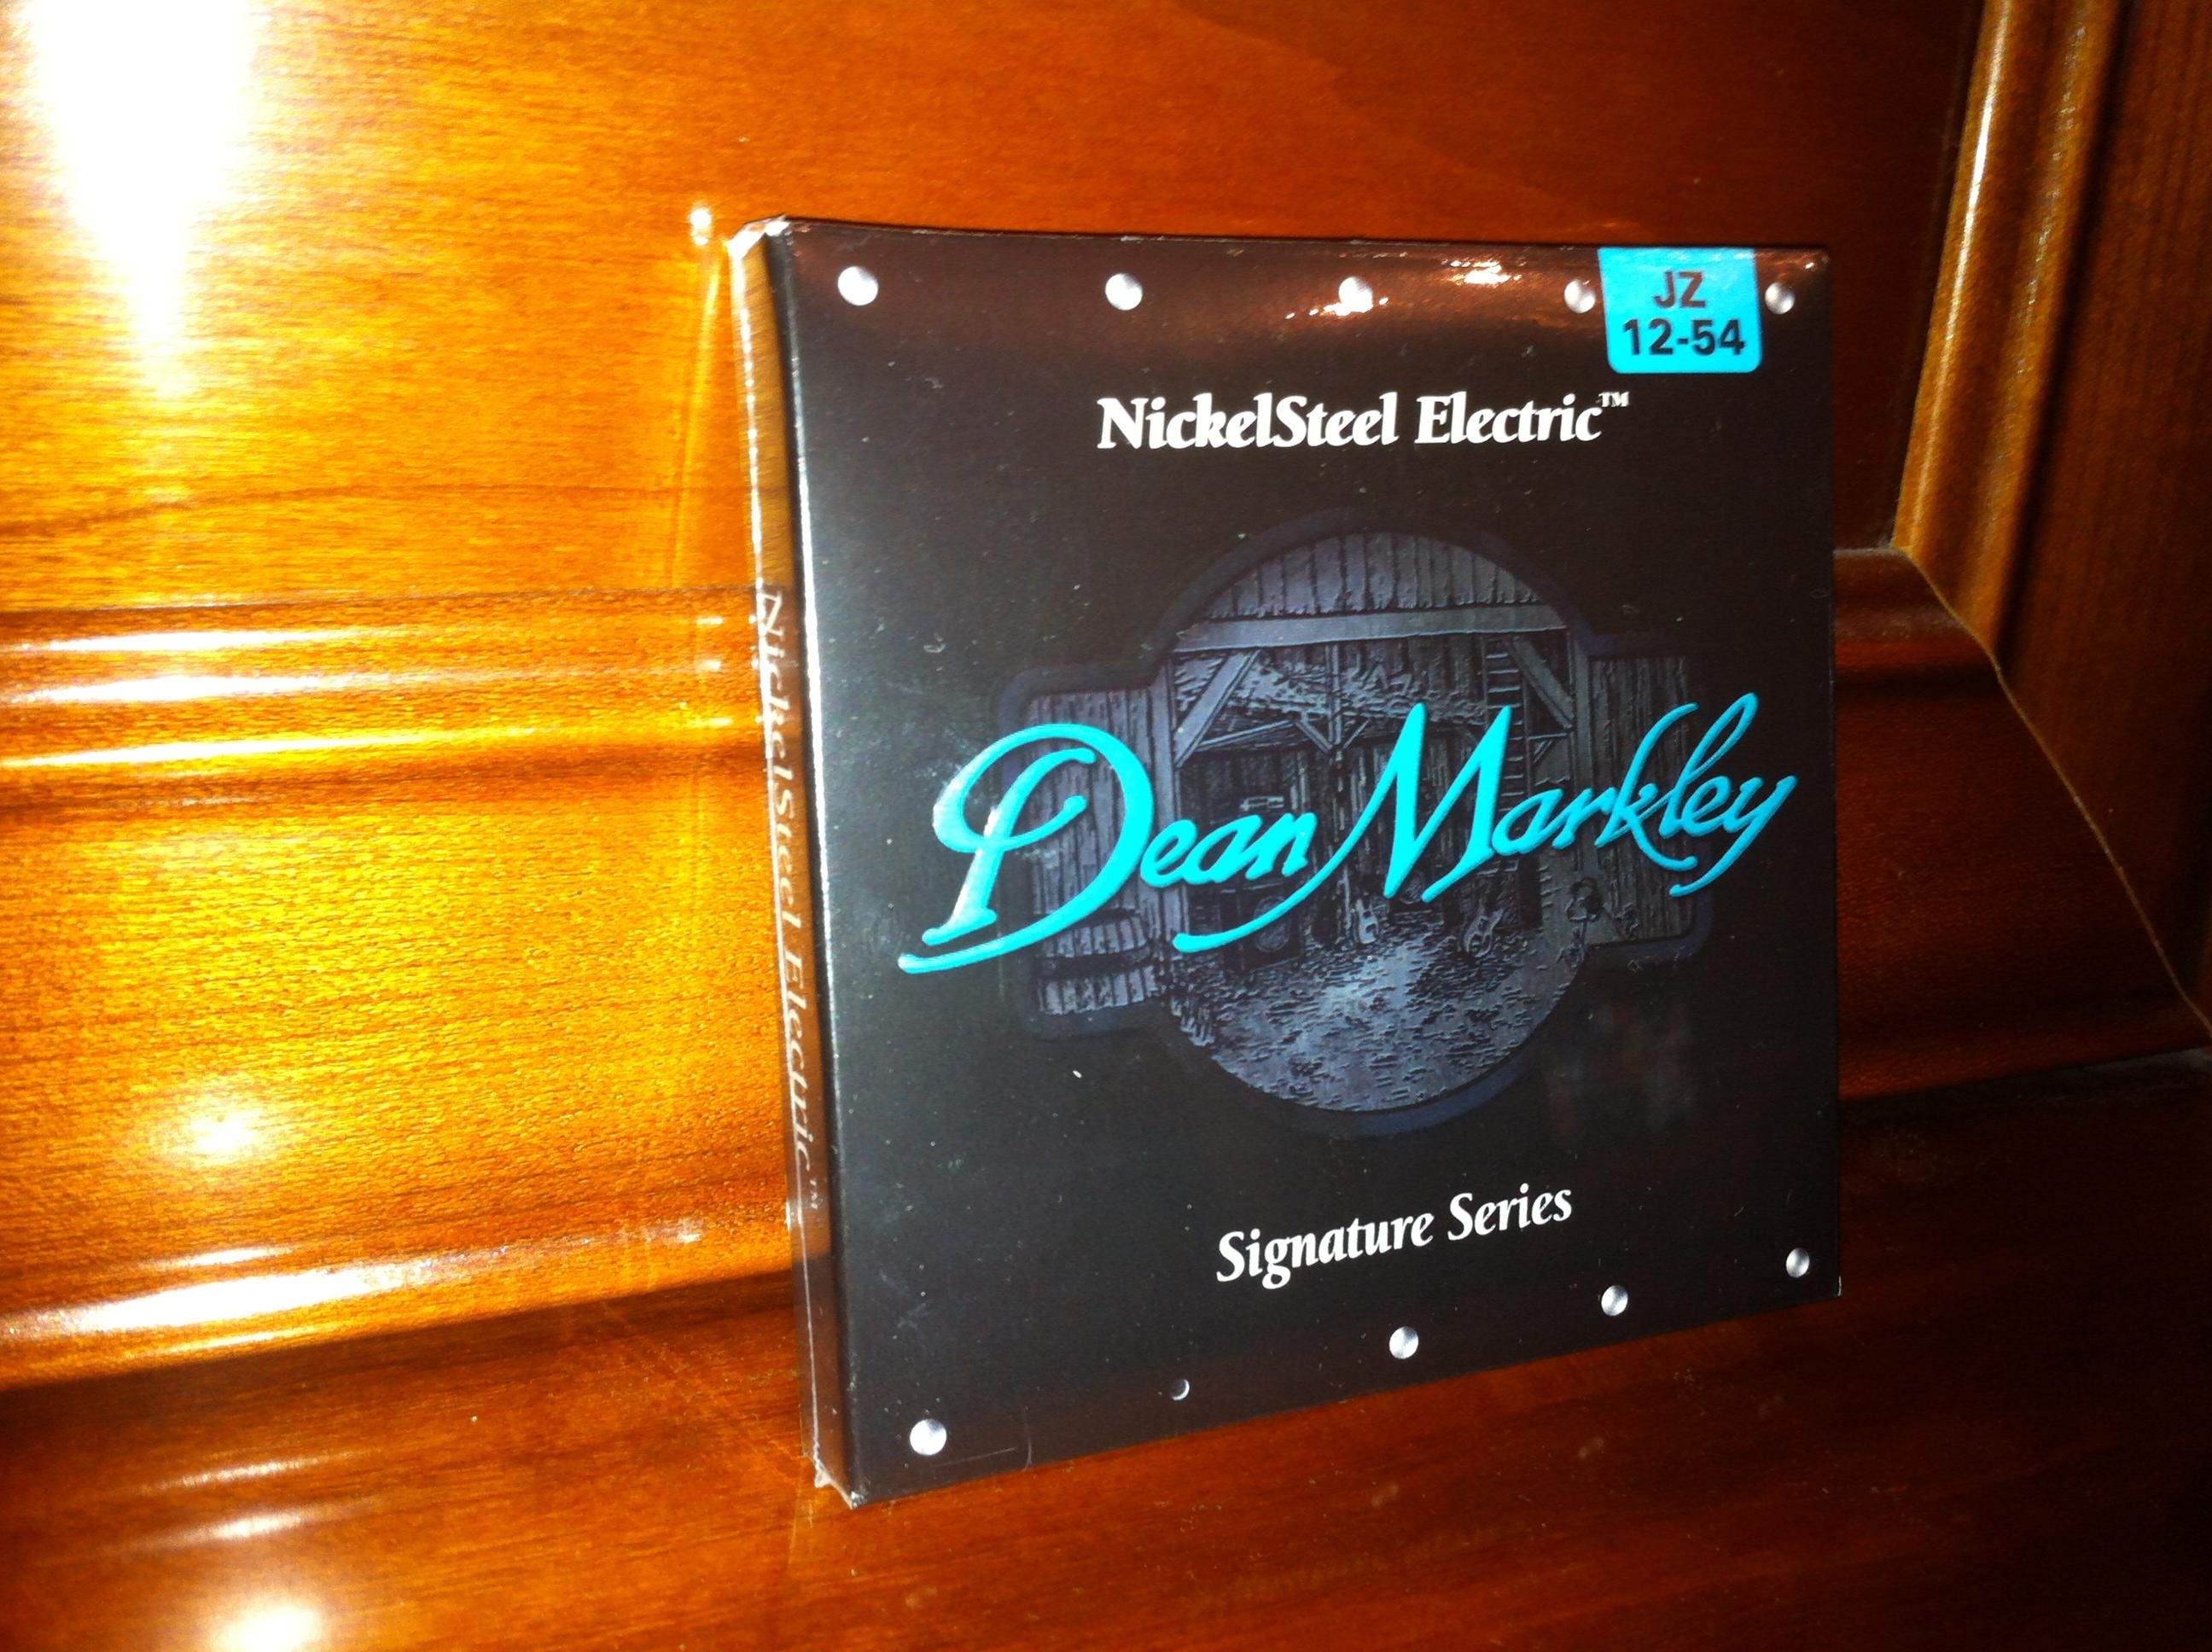 Nickelsteel Electric 2506 12 54 Jz Jazz Dean Markley